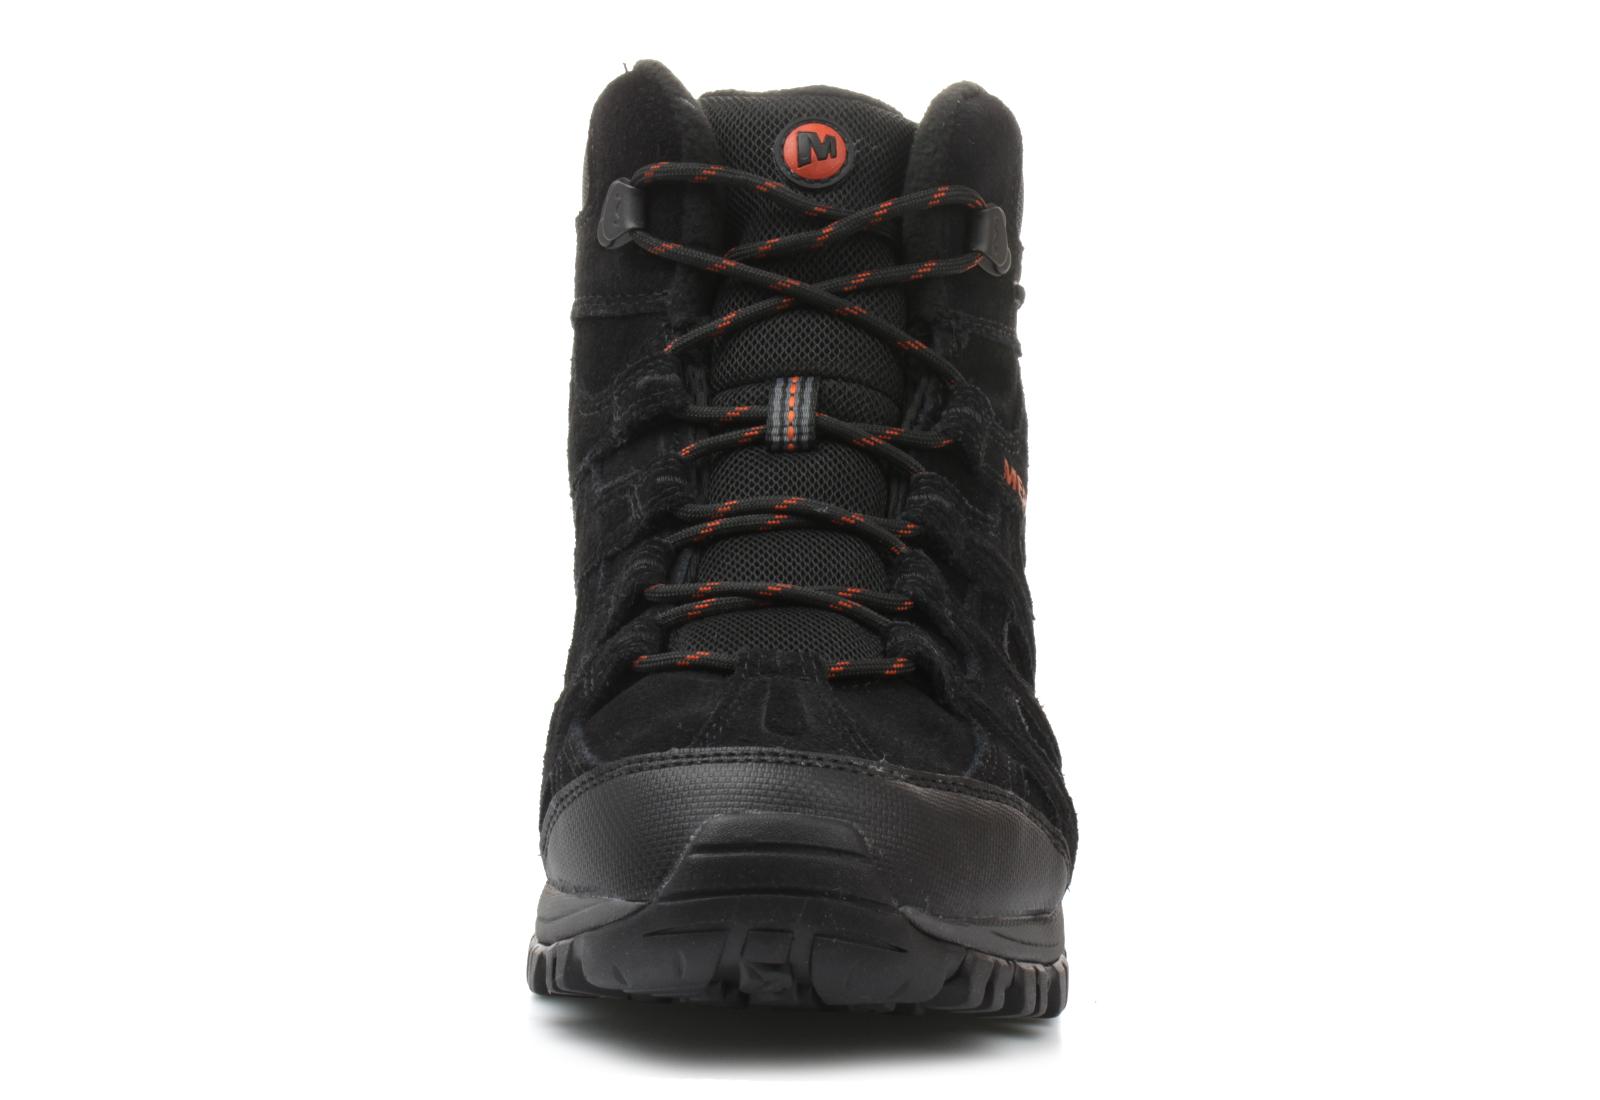 Merrell Bakancs - Phoenix 2 Mid Thermo - J09599-blk - Office Shoes ... b034815d5e